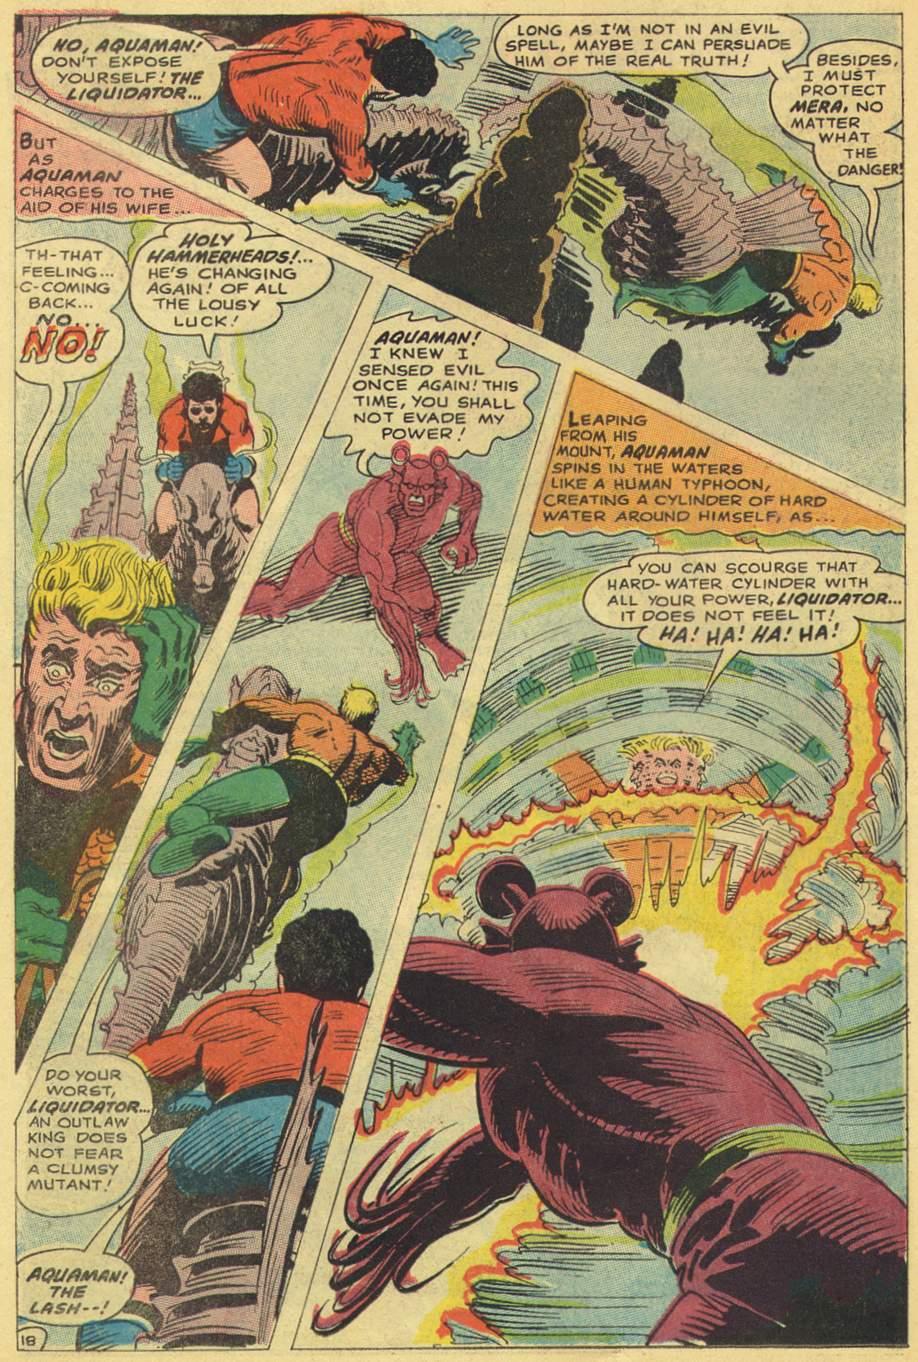 Read online Aquaman (1962) comic -  Issue #38 - 26